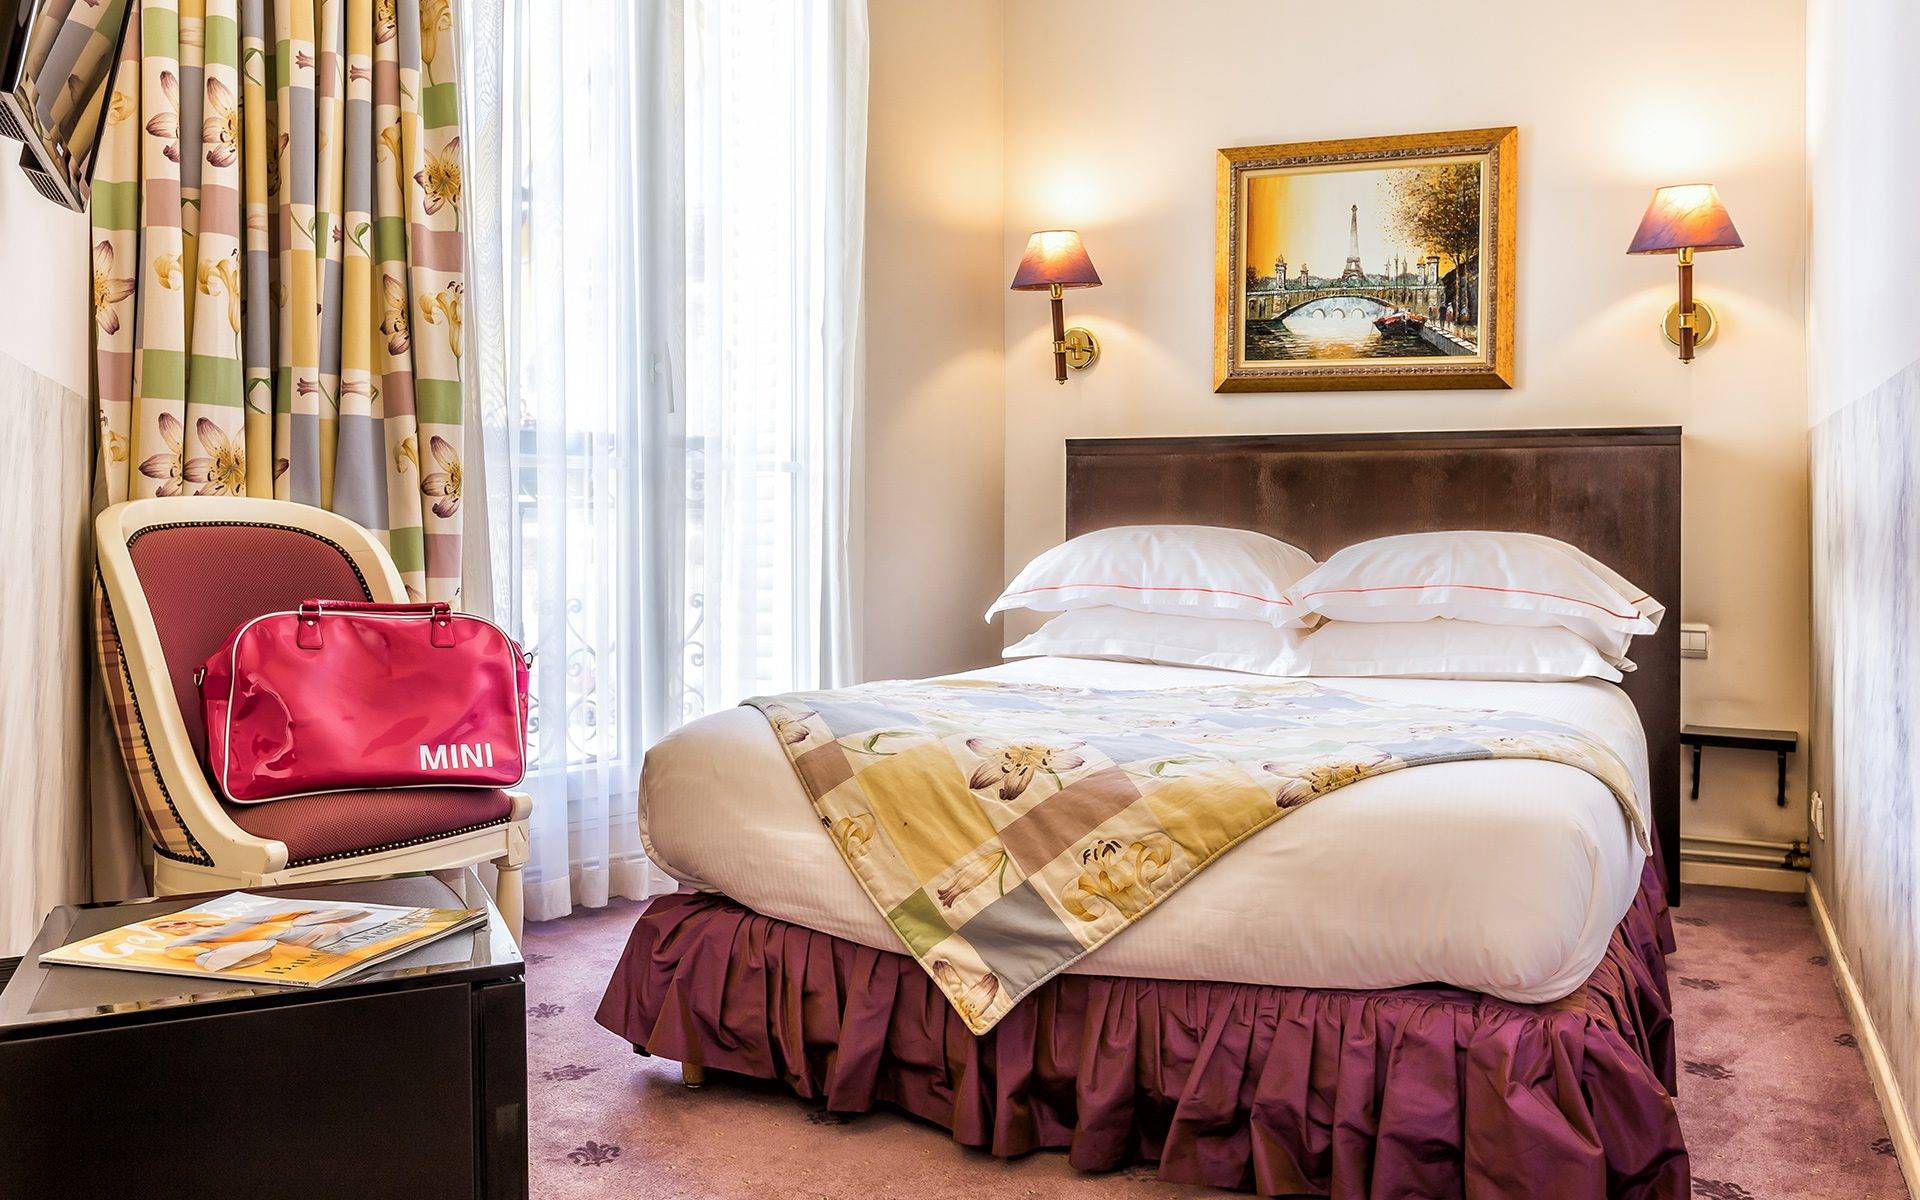 Hotel-Regence_Chambre204-Doubleousingle-5648-HDR-min